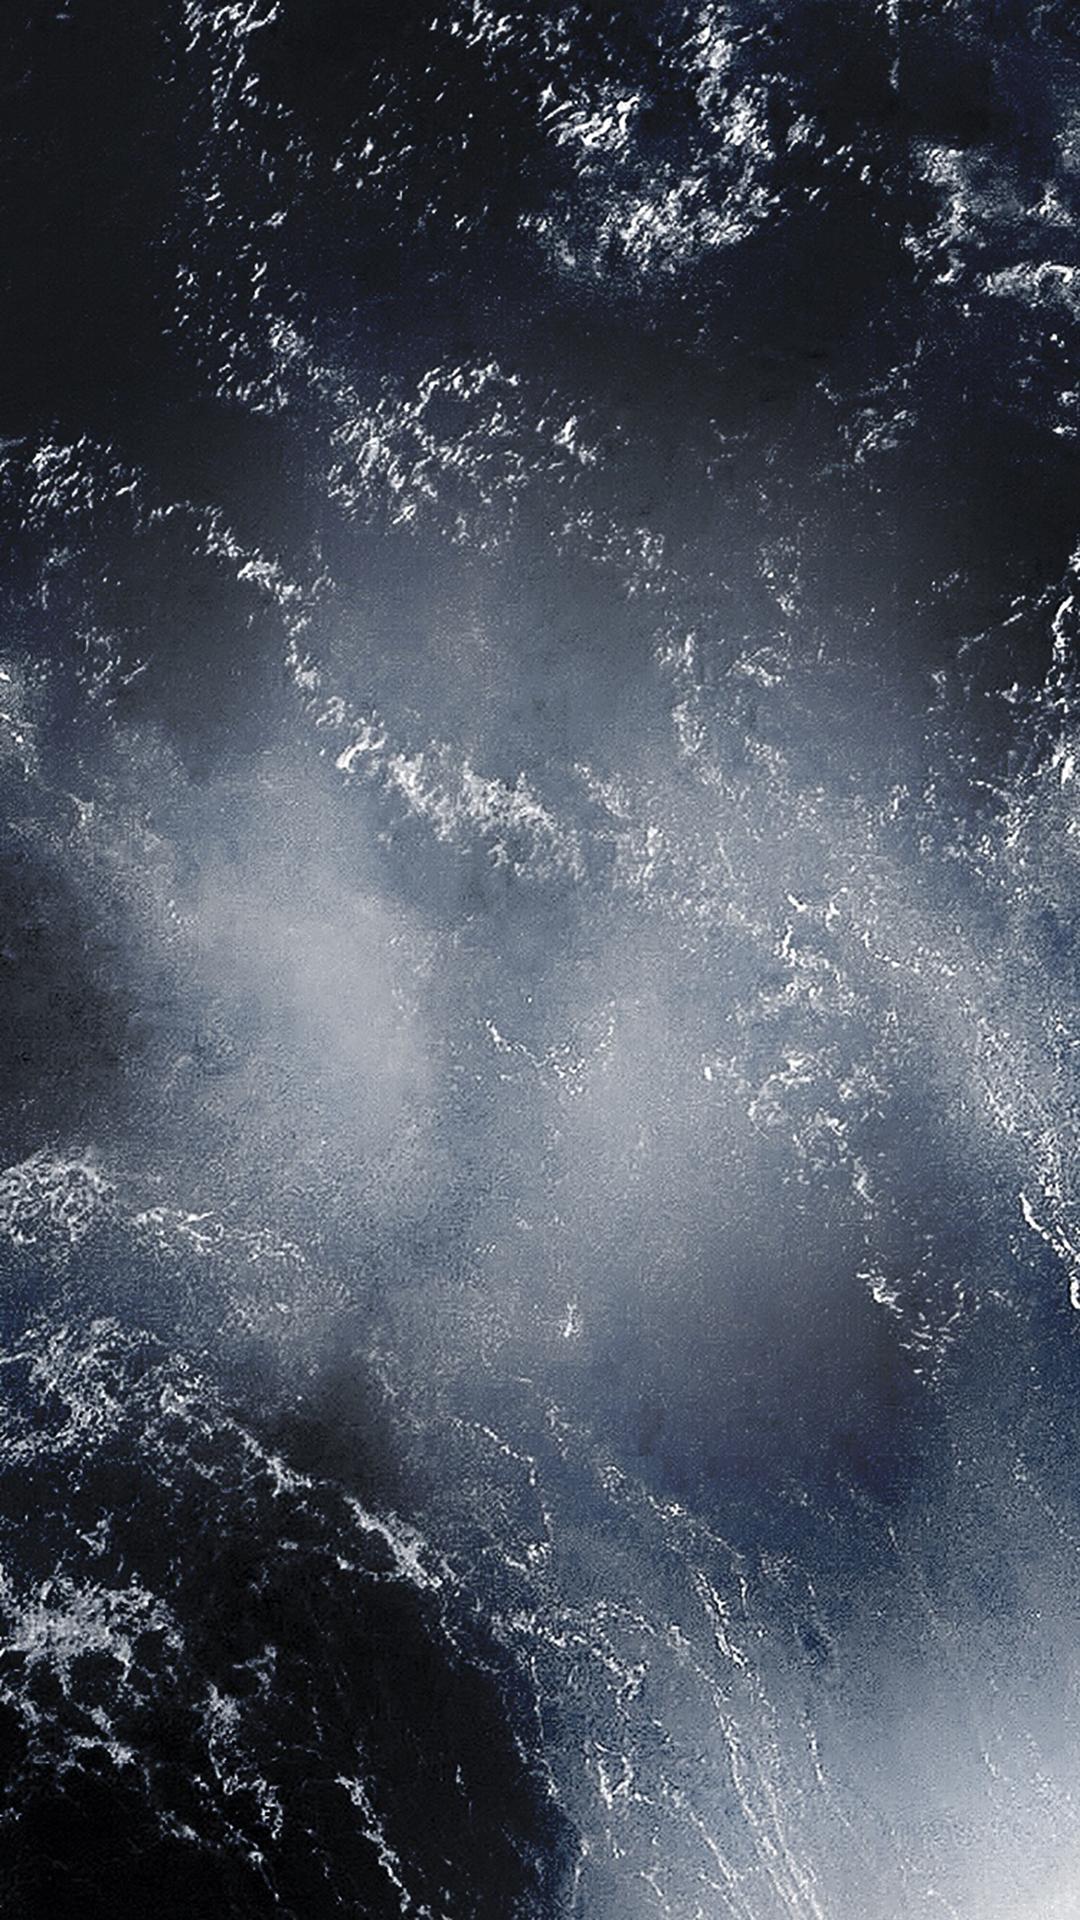 dark-wallpaper-applifevn-2